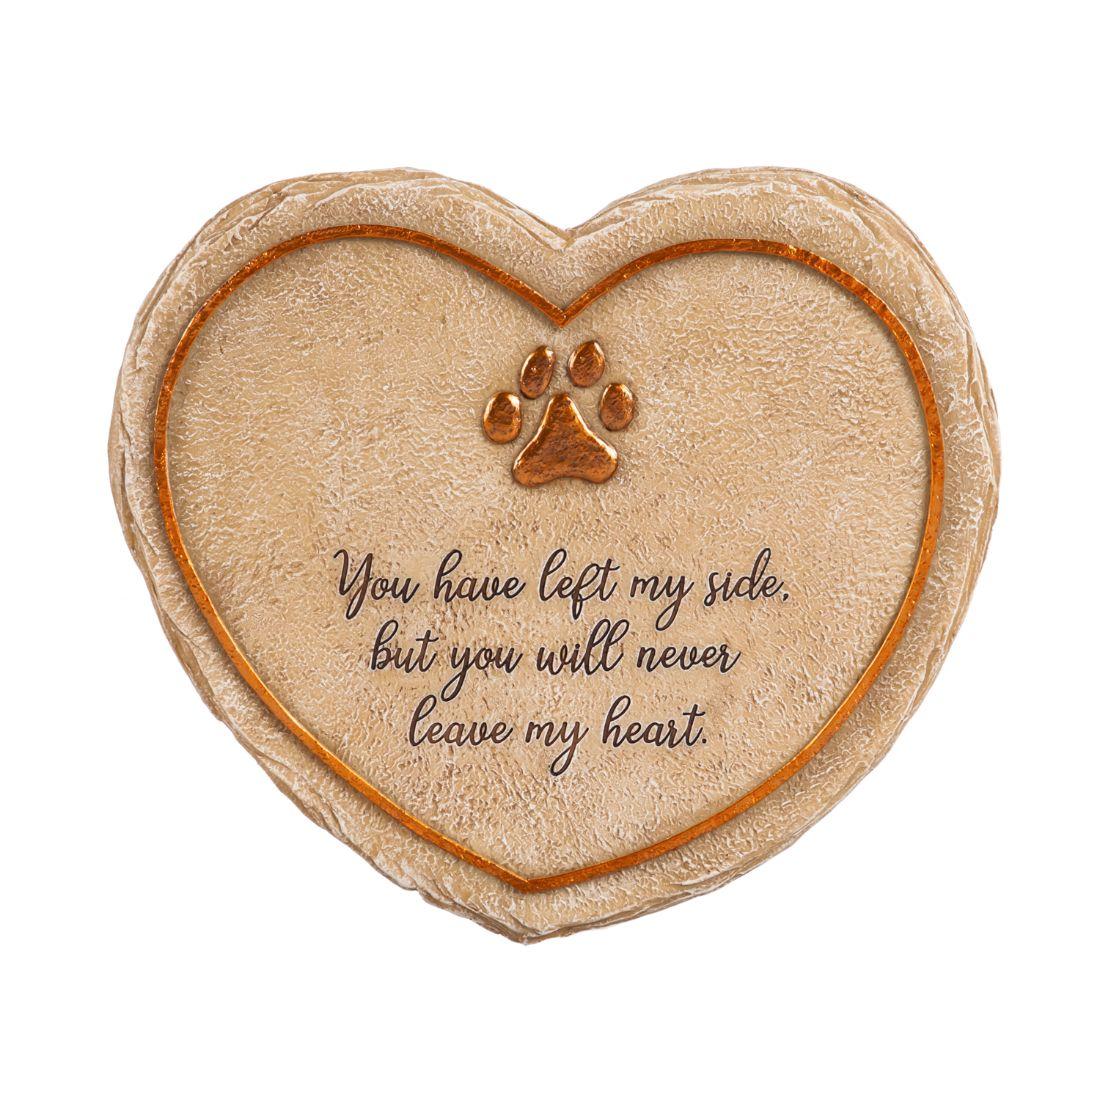 "11"" Heart Shaped Pet Memorial Garden Stone, Never Leave My Heart"